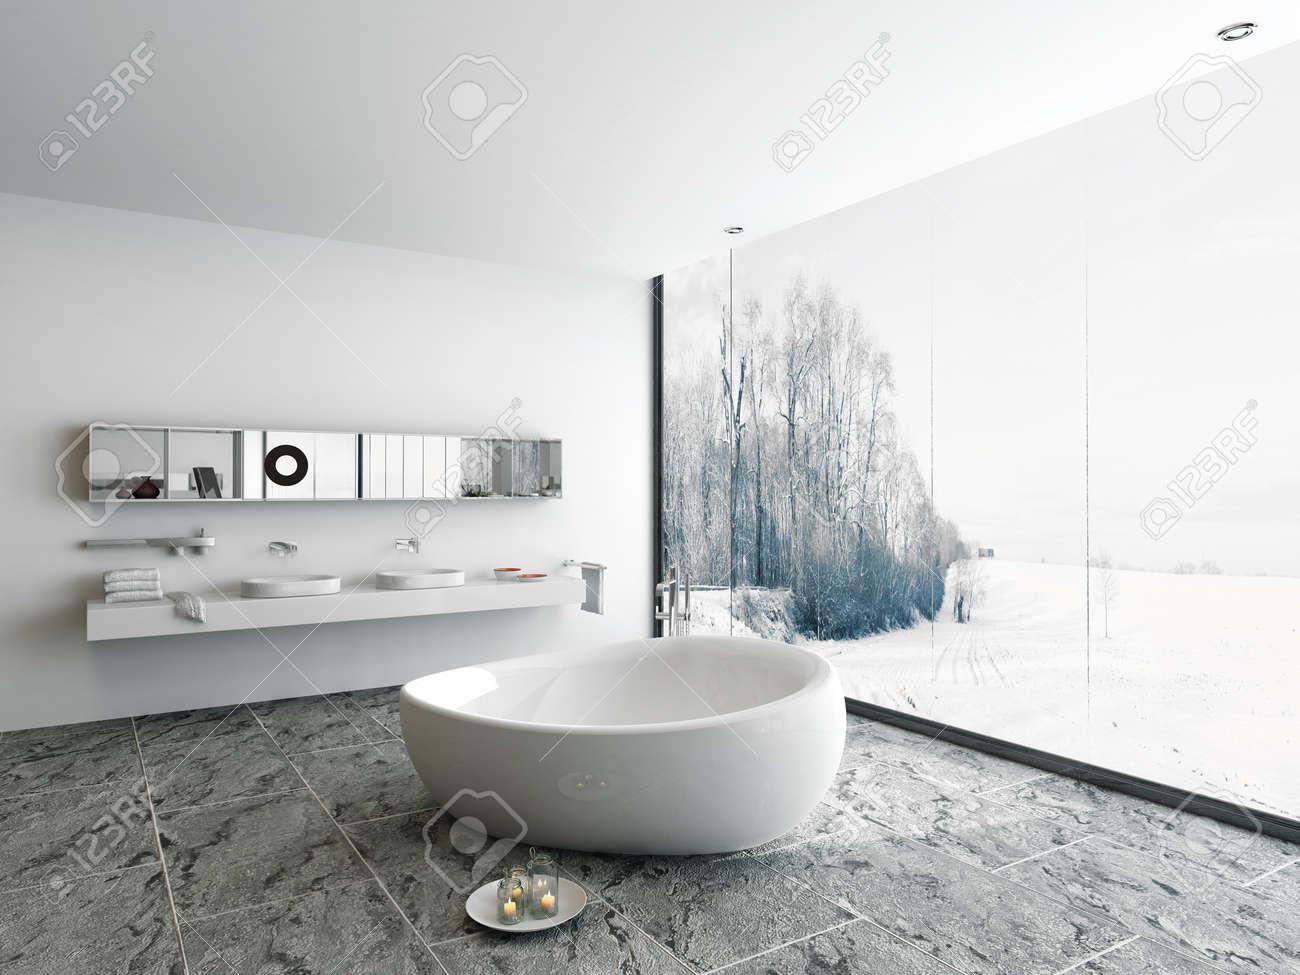 Modern Bathroom Interior With Huge Window Winter Landscape View Stock Photo